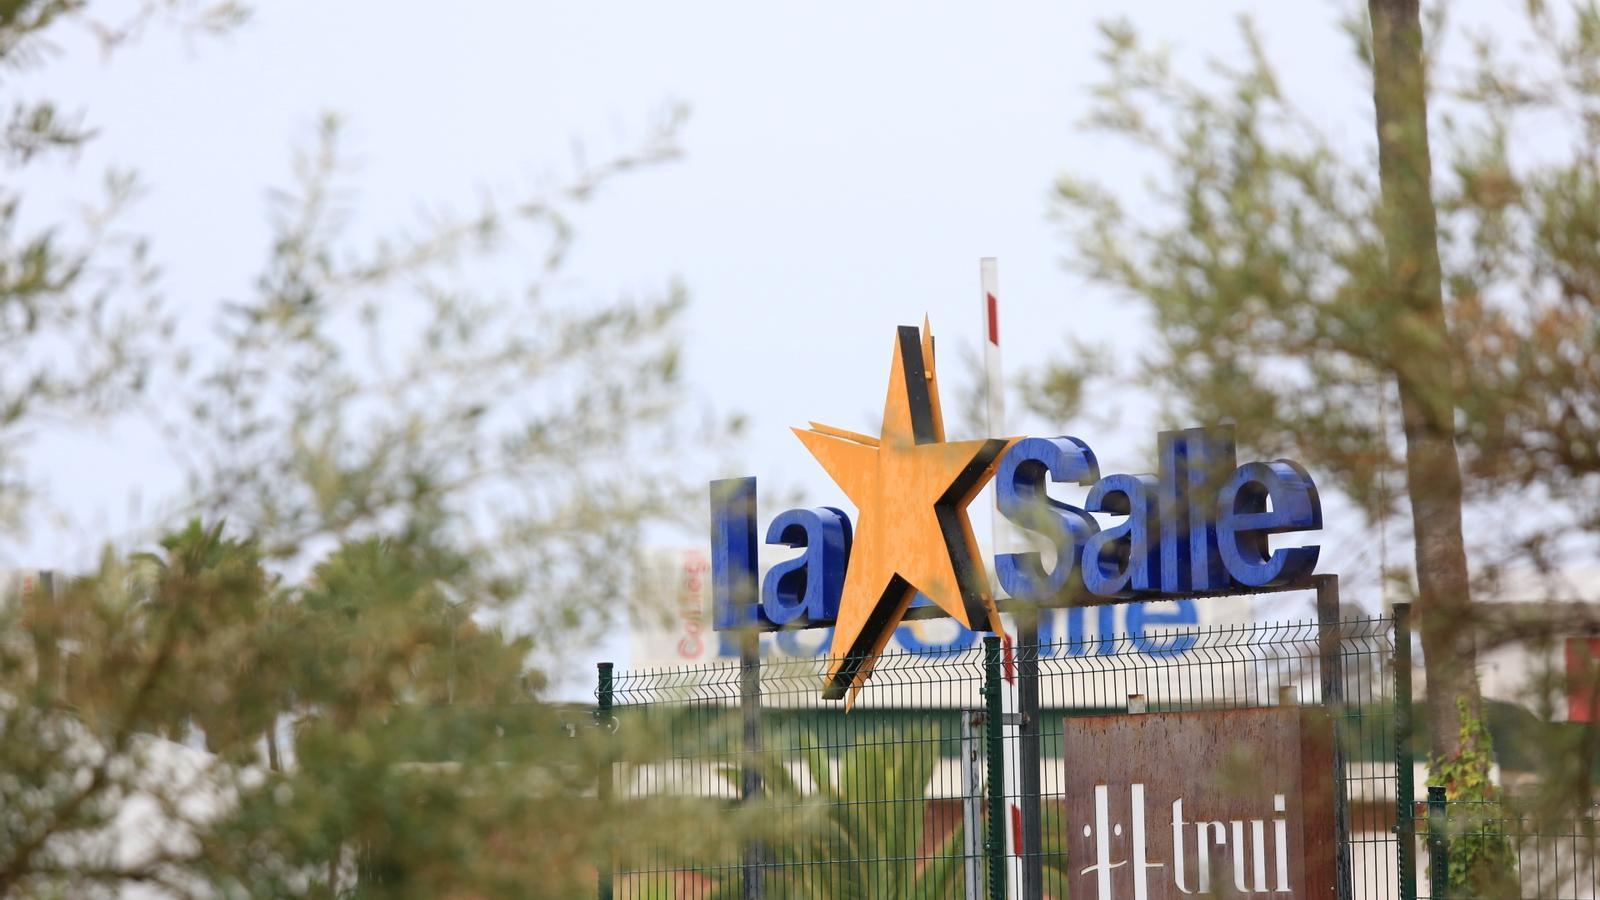 Imatge de l'escola de La Salle de Palma. / ISMAEL VELÁZQUEZ